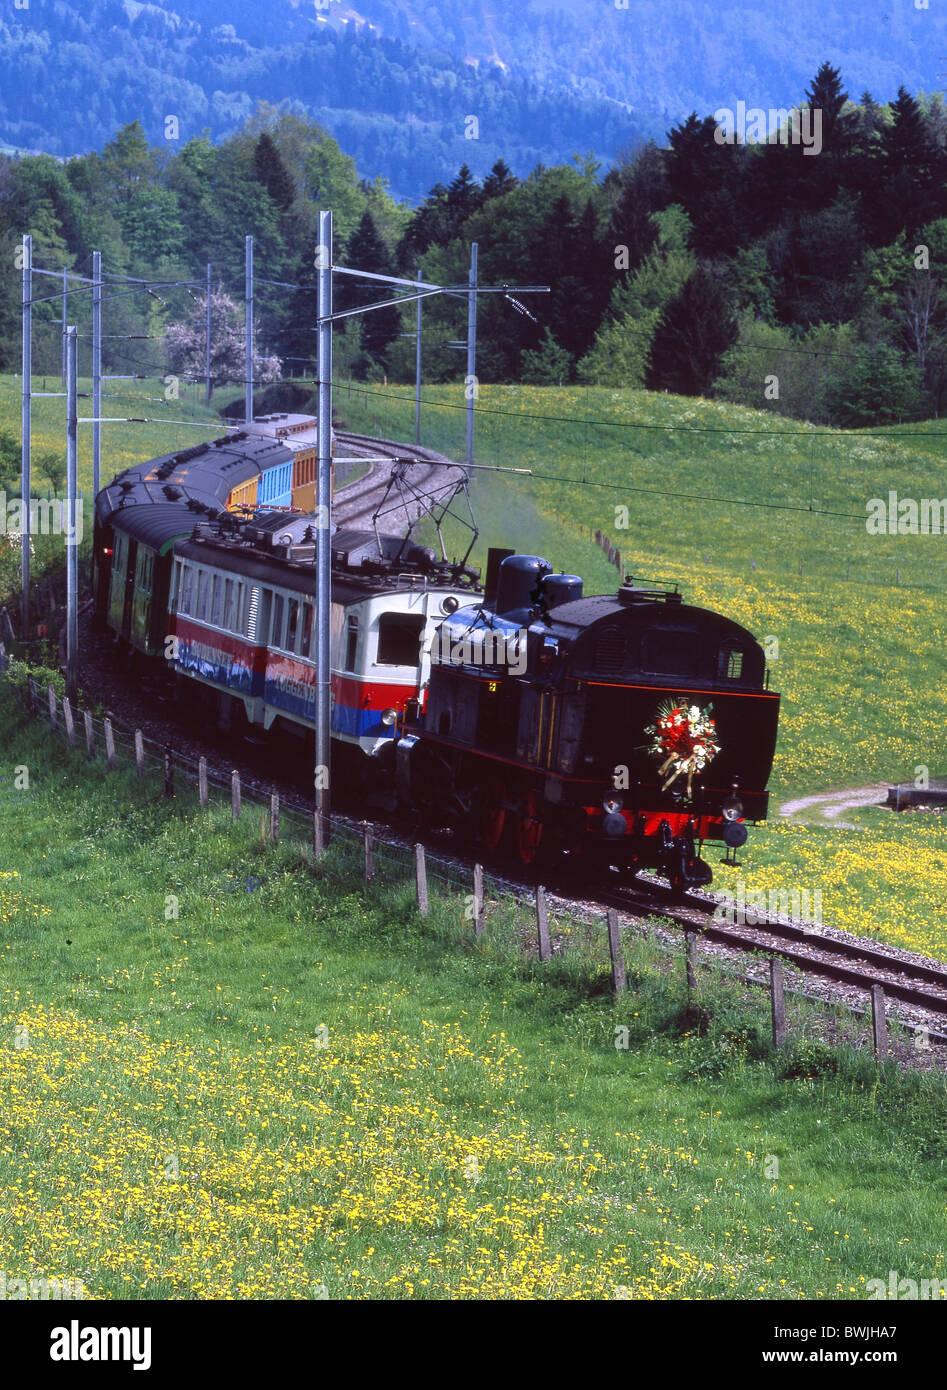 steam train Cupid train Amor Toggenburg steam vapor steam railway railway train railroad steam locomotive s - Stock Image